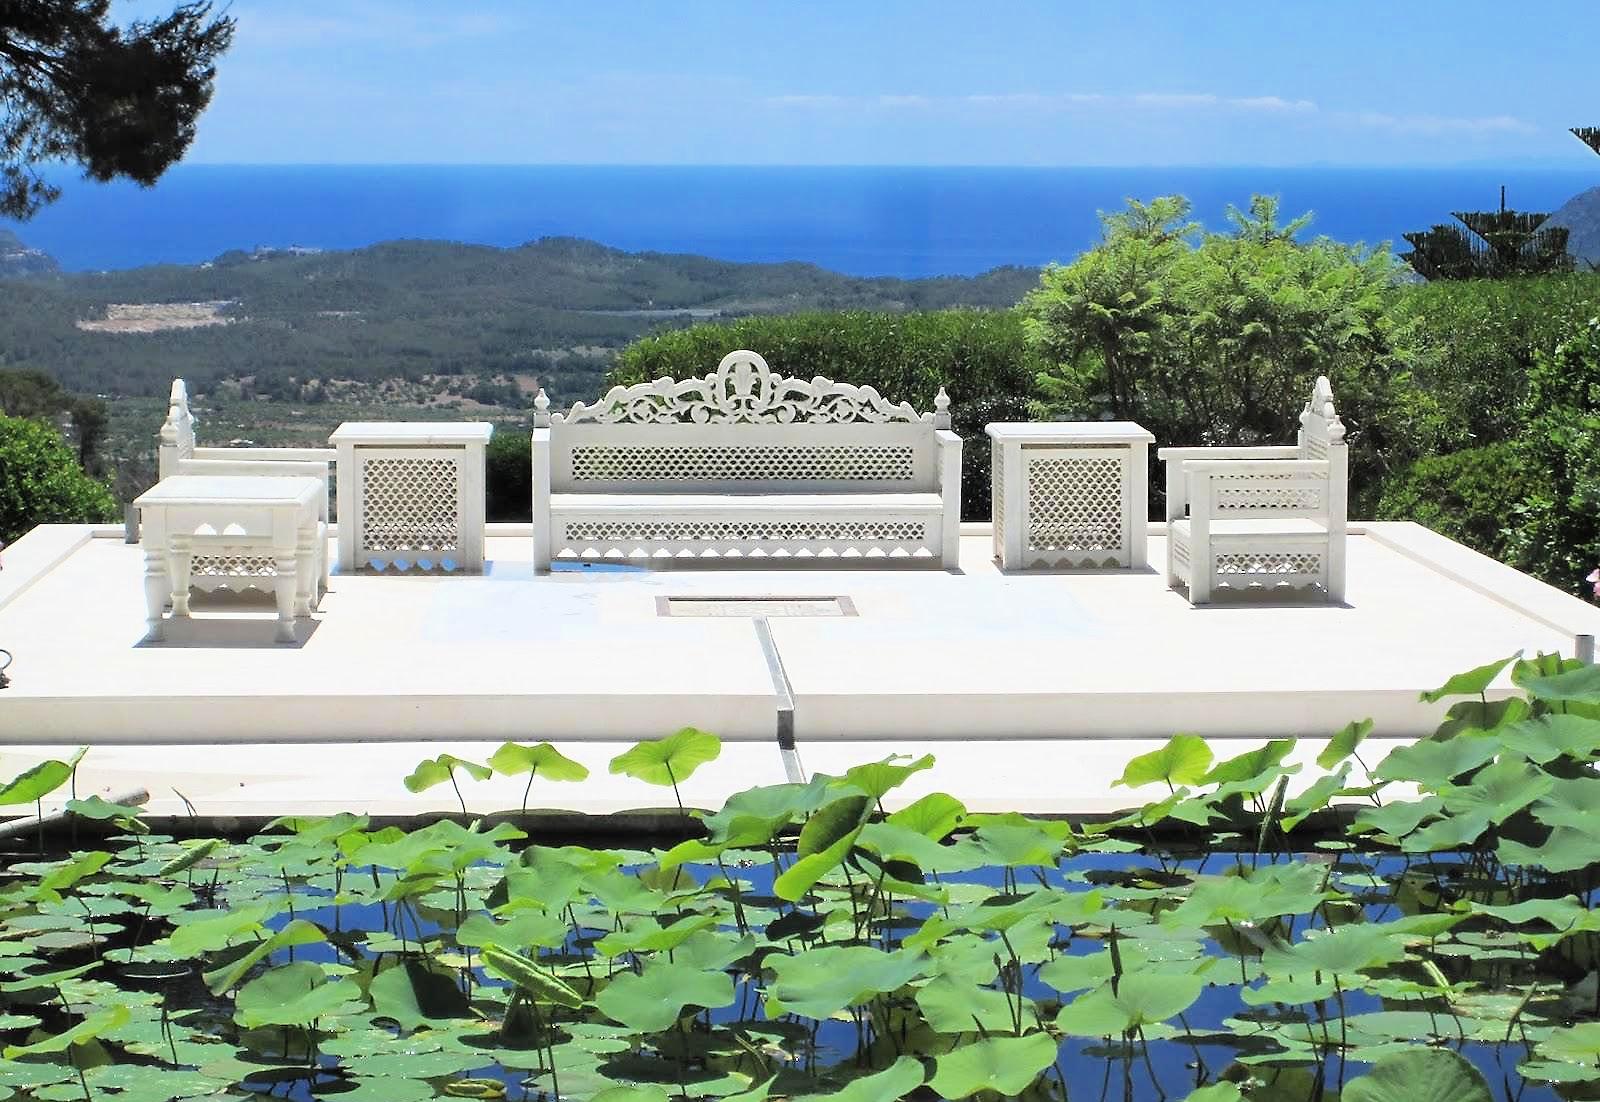 Unique Property With Sea Views For Sale Son Font, Mallorca,